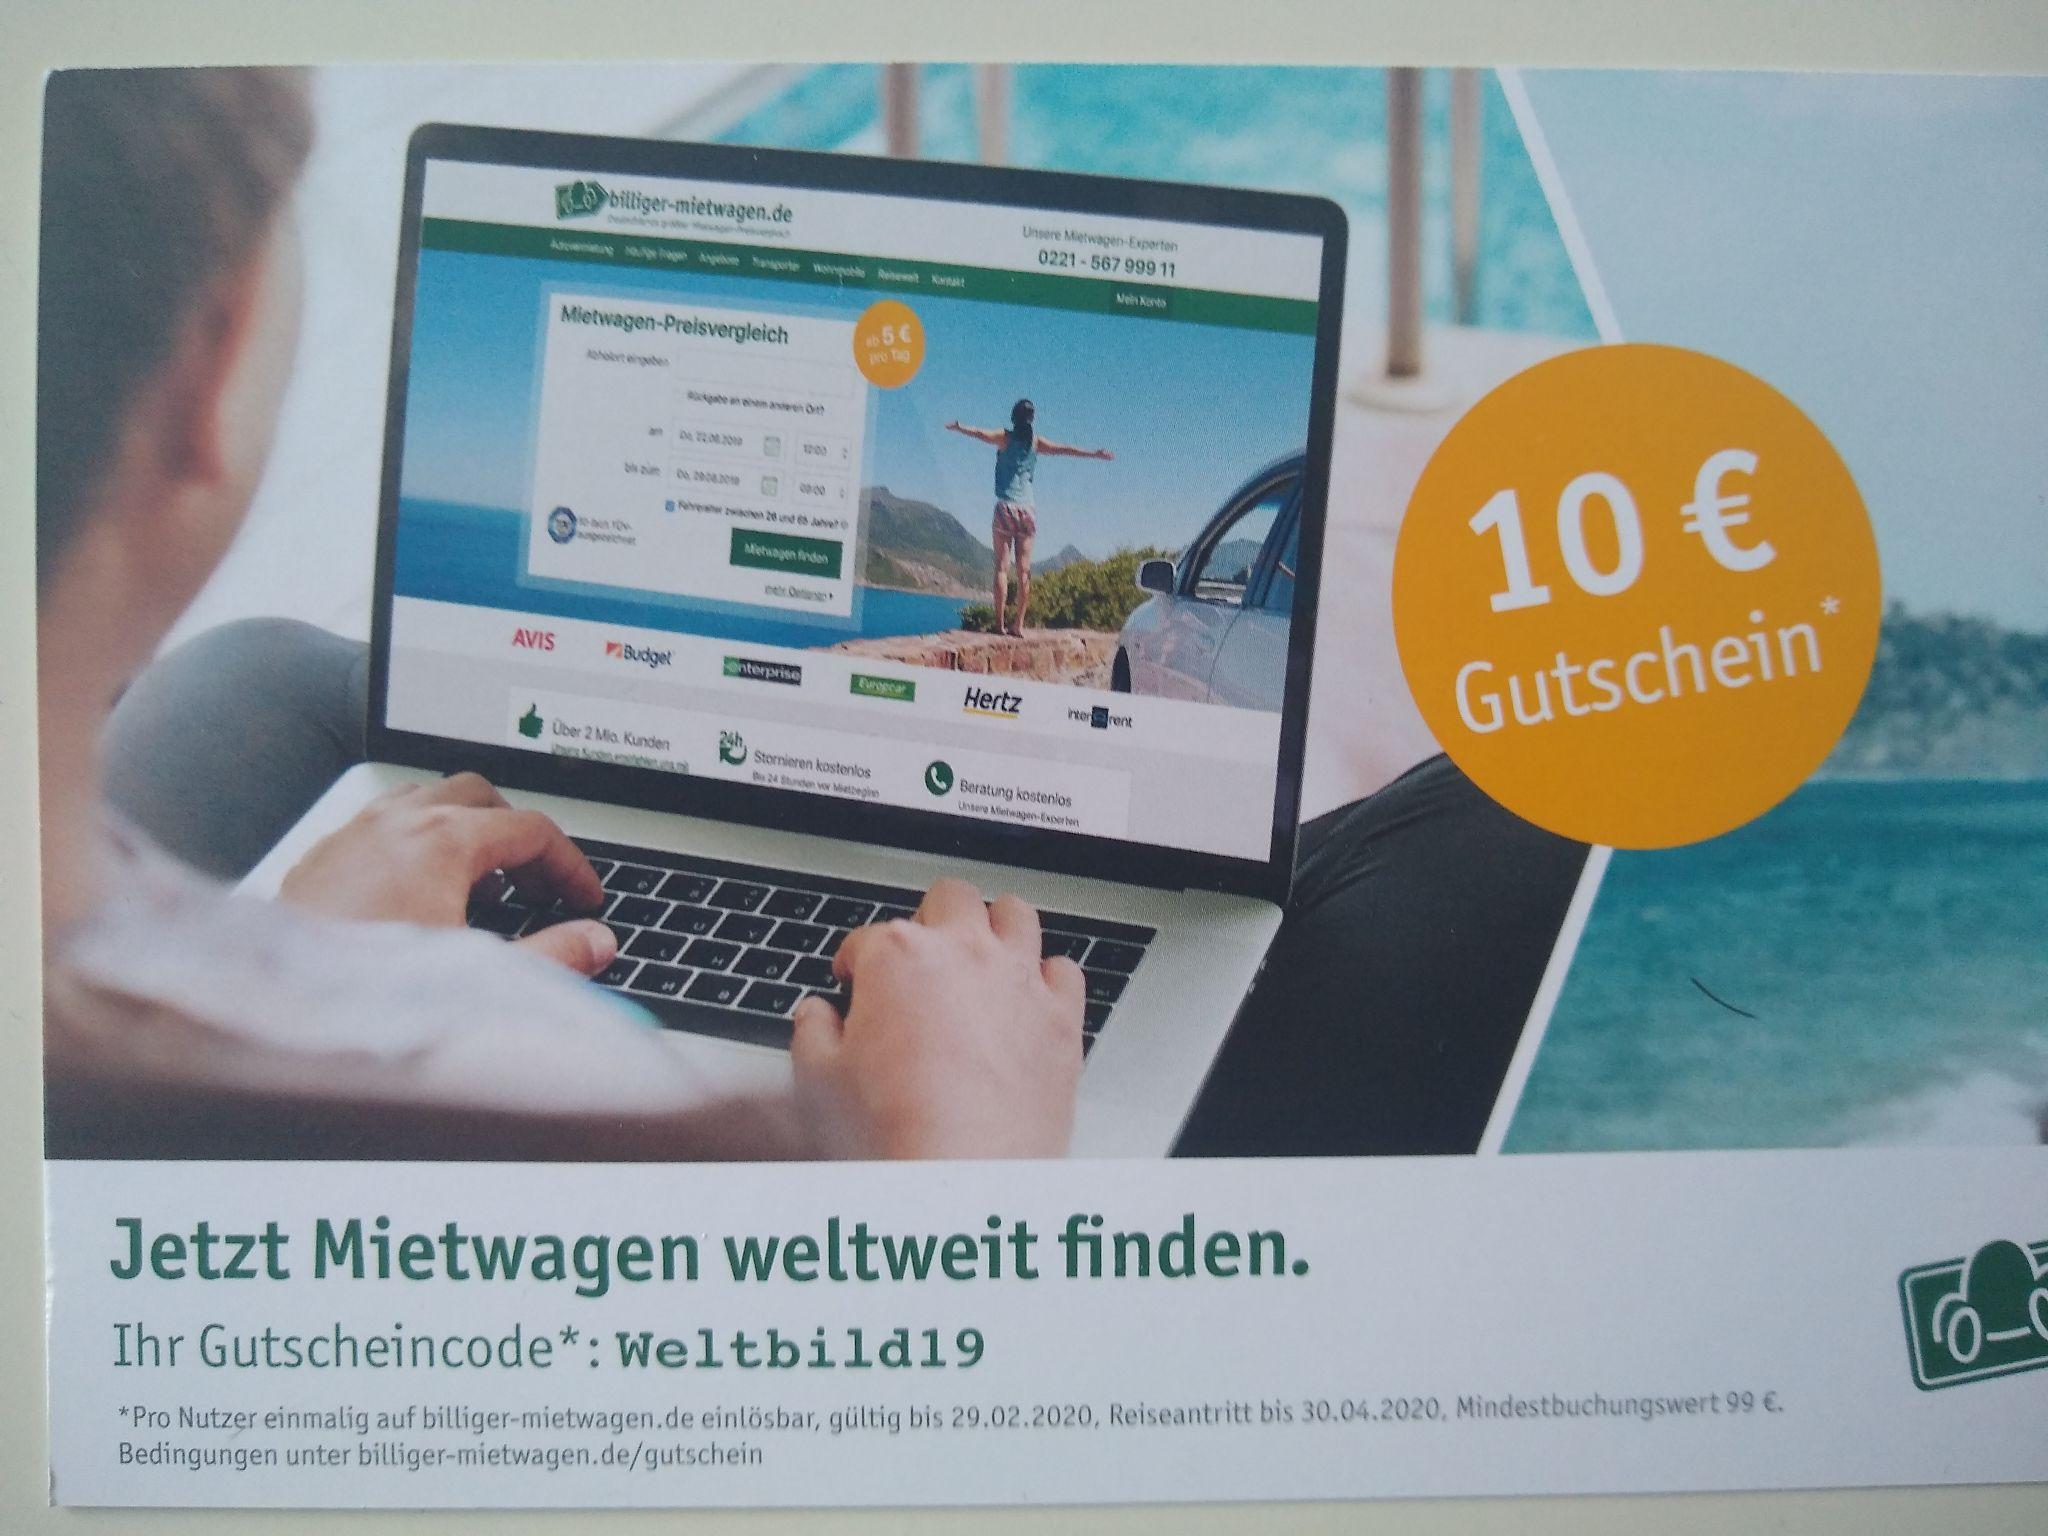 Billiger-Mietwagen.de Ab 99 € gibt's 10 € Rabatt.